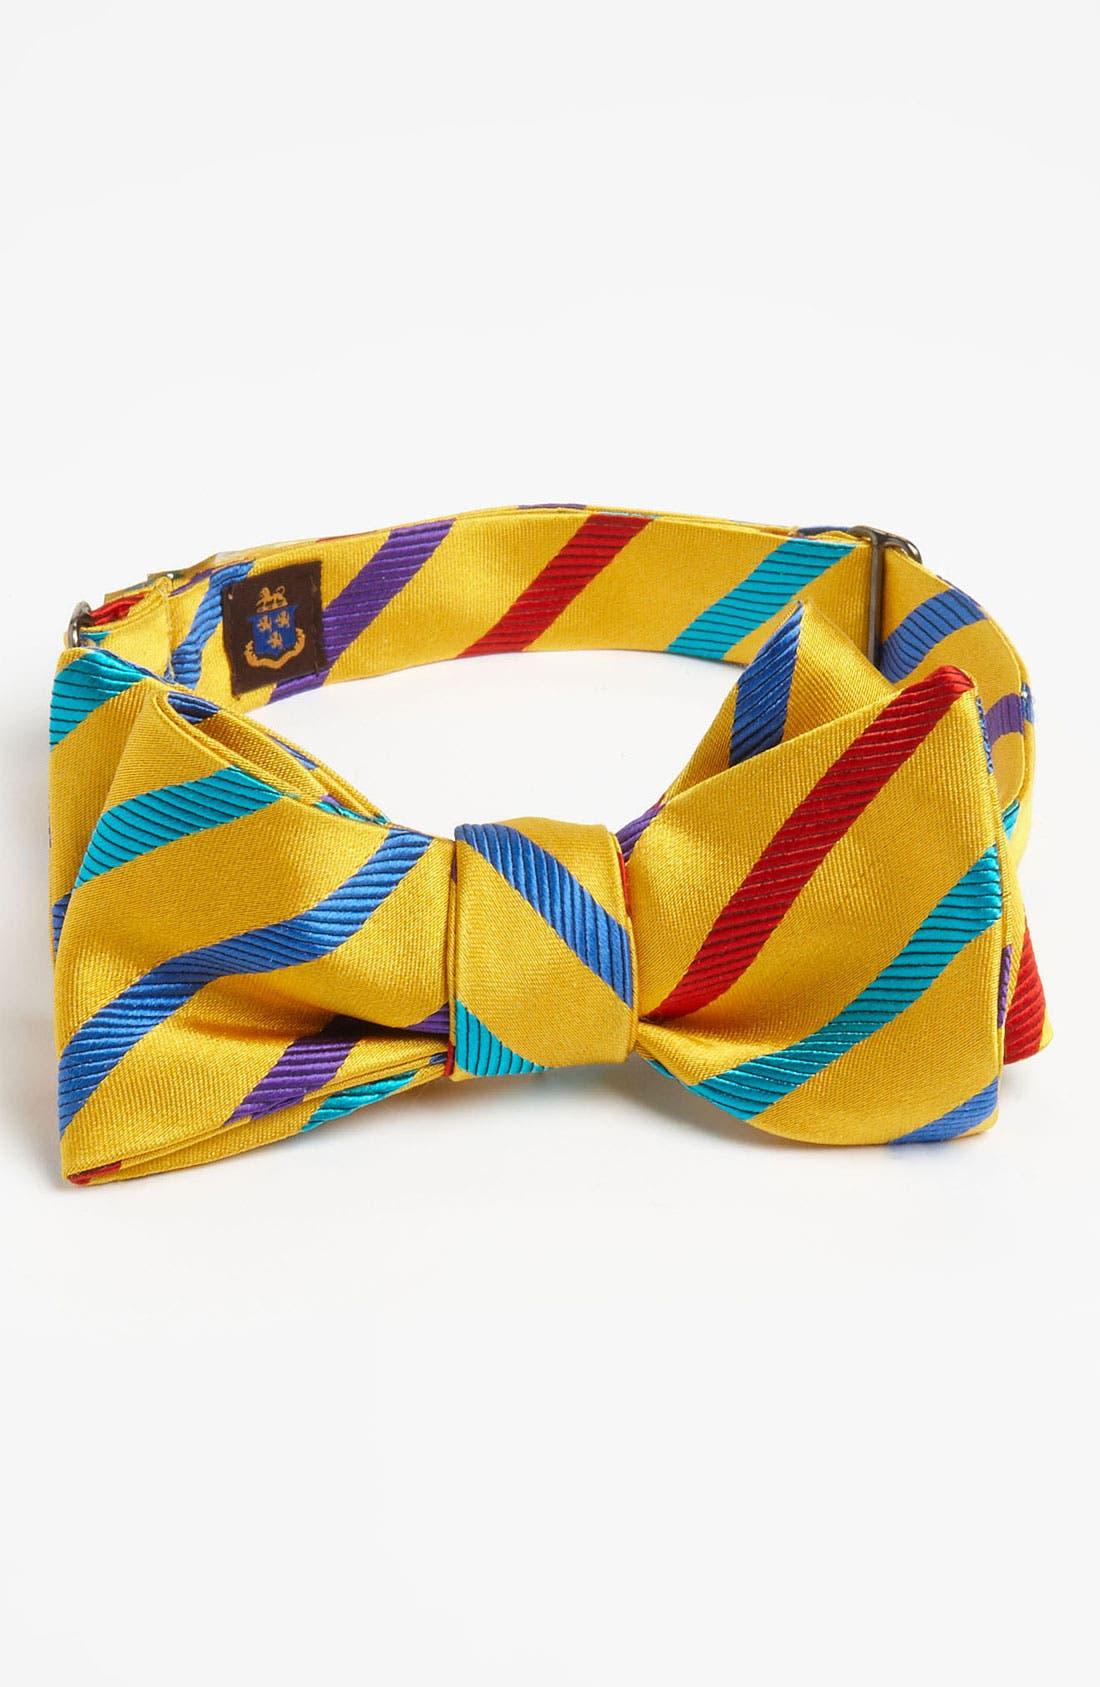 Alternate Image 1 Selected - Robert Talbott Silk Bow Tie